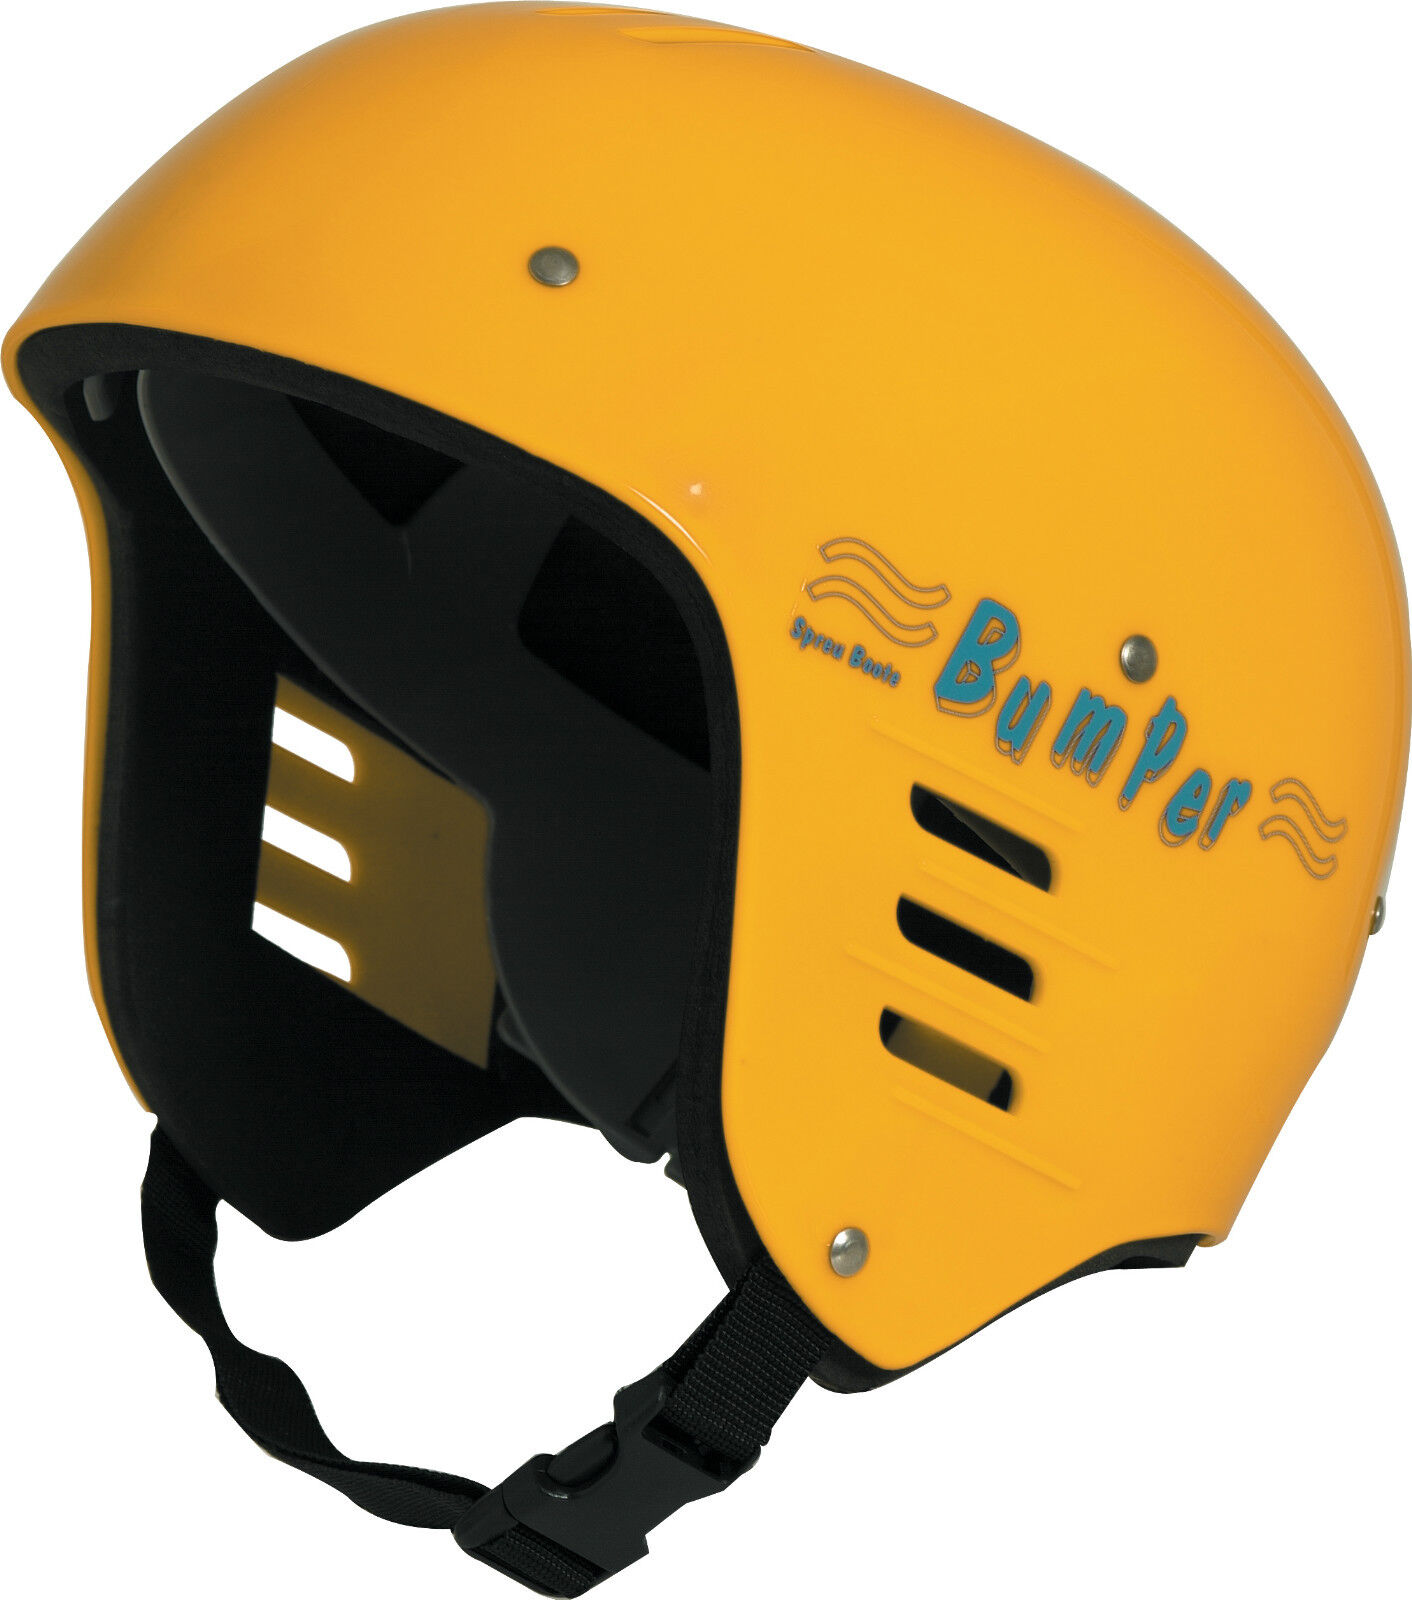 Bumper Helmet - YELLOW - Junior - Kayak,Canoe,Sail,Watersports,Centre,Instructor